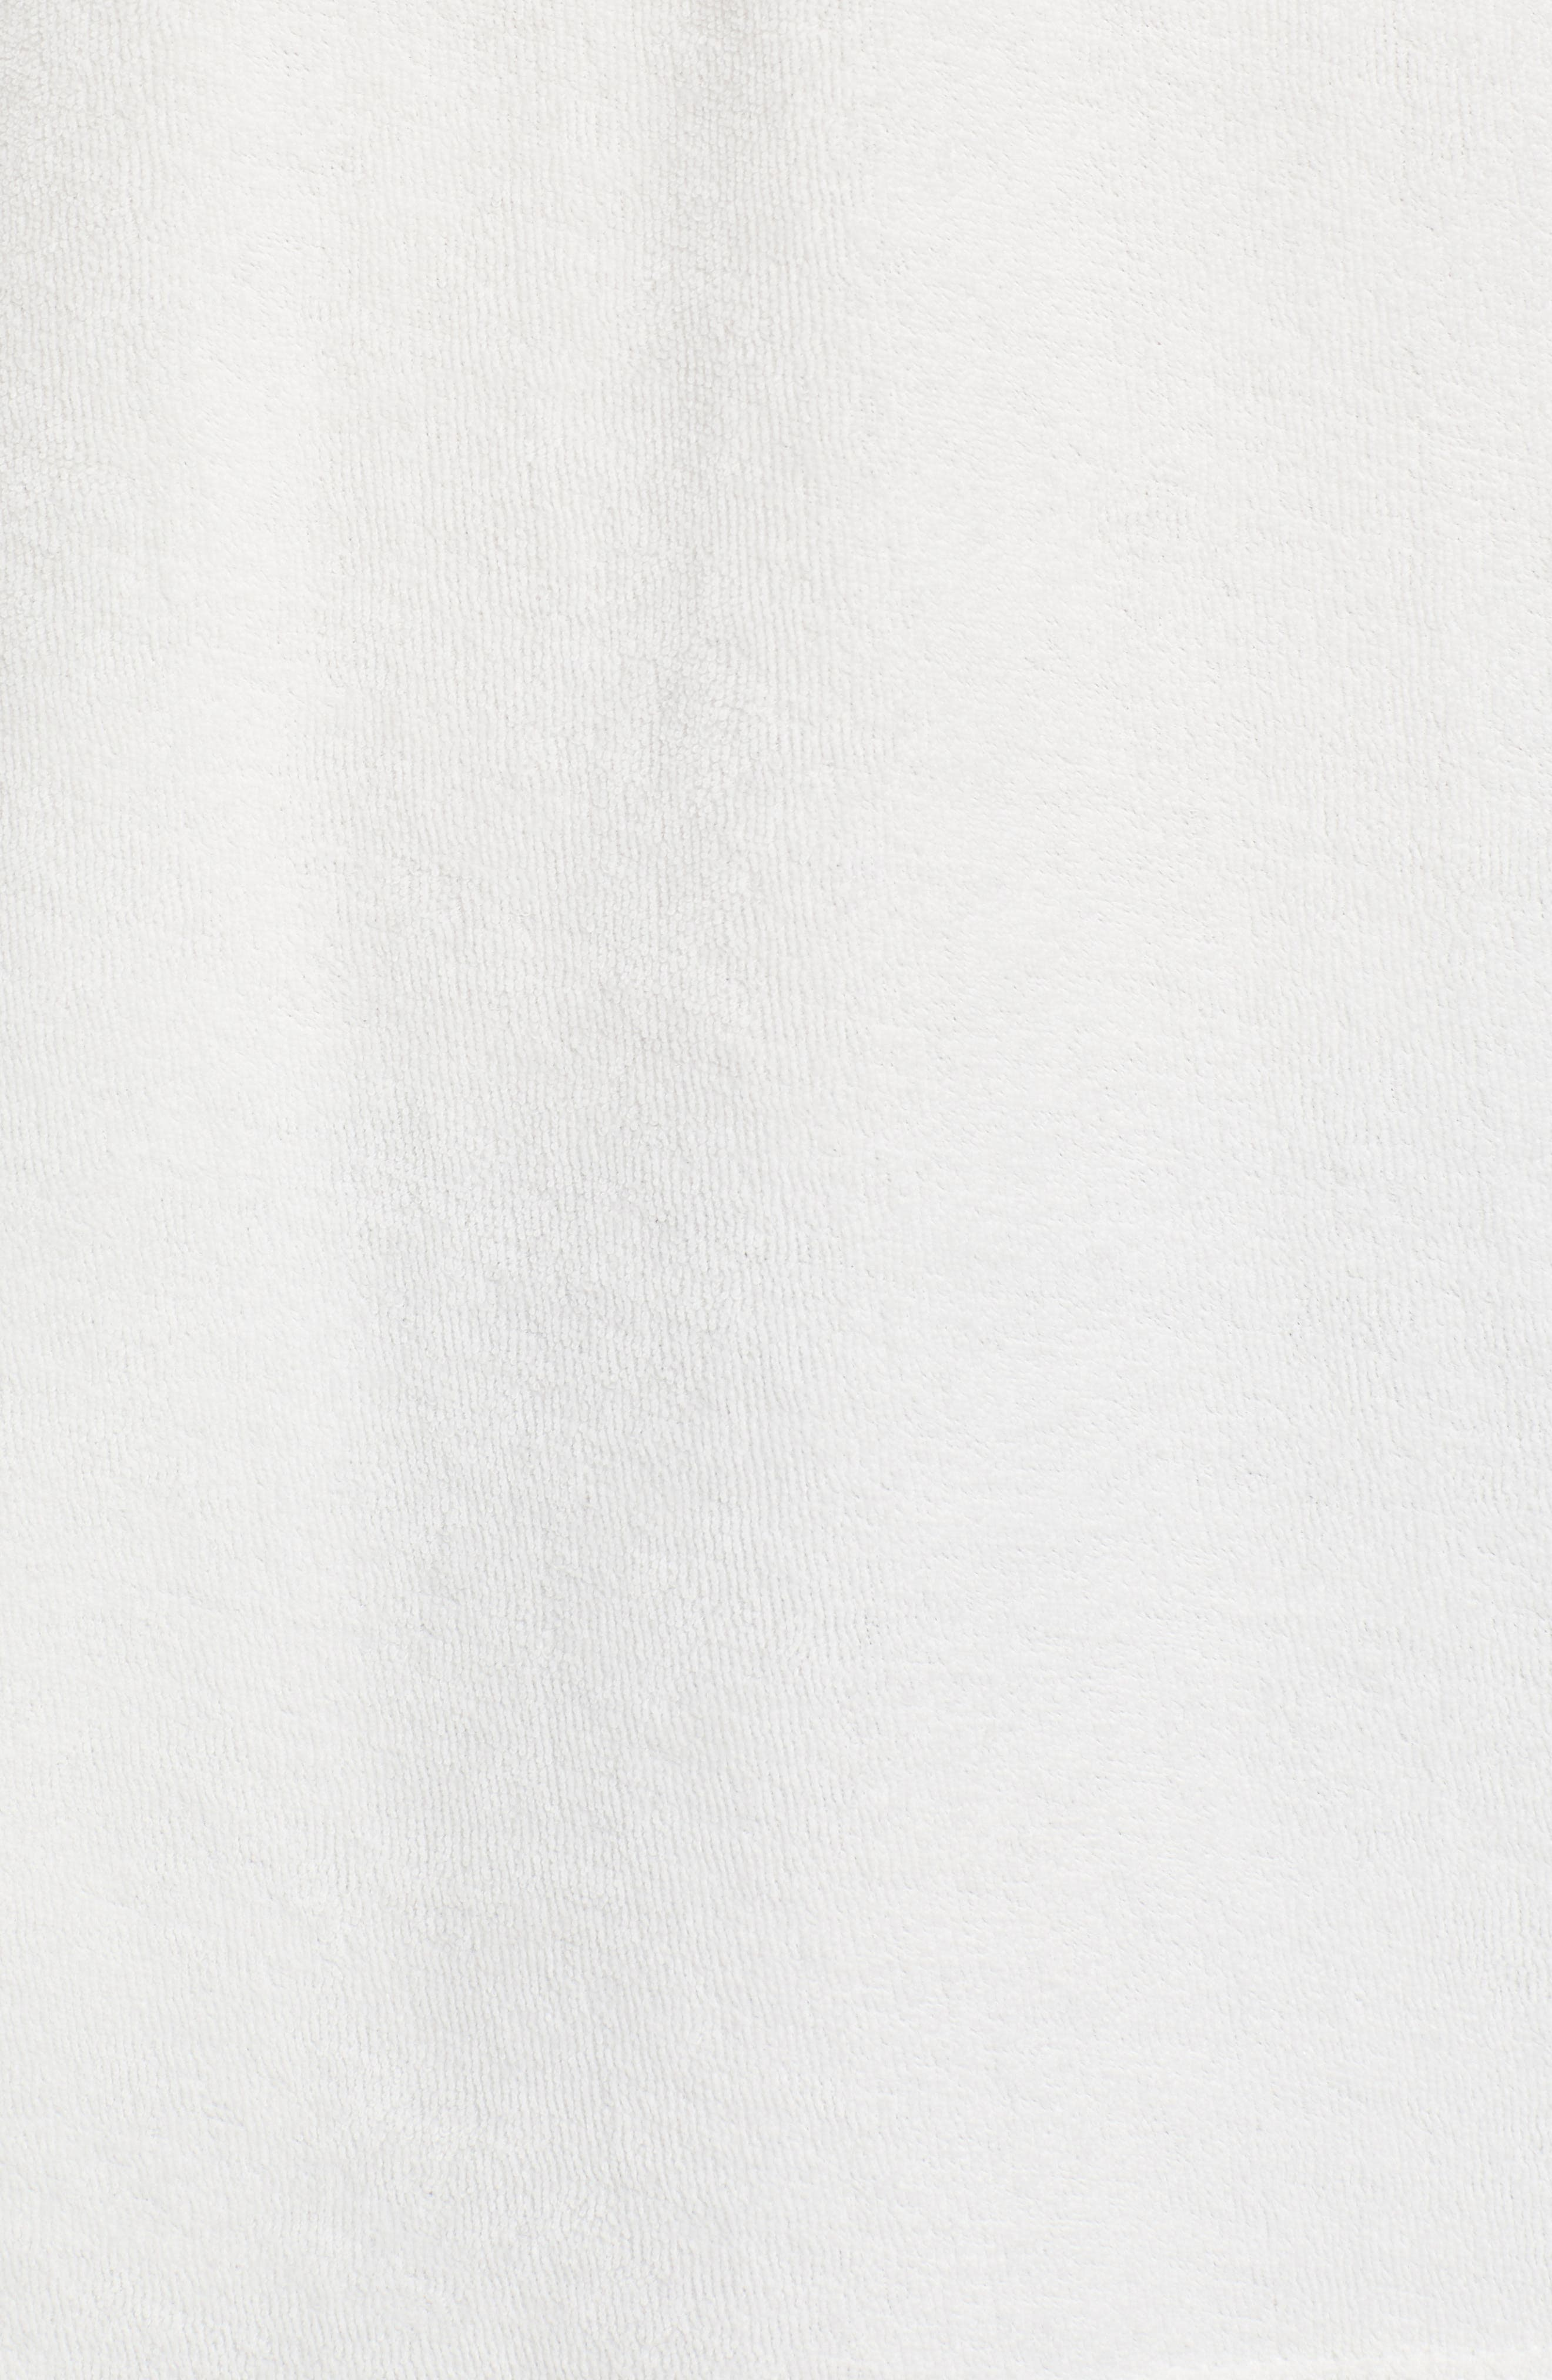 Towel Whip Polo,                             Alternate thumbnail 5, color,                             MILK